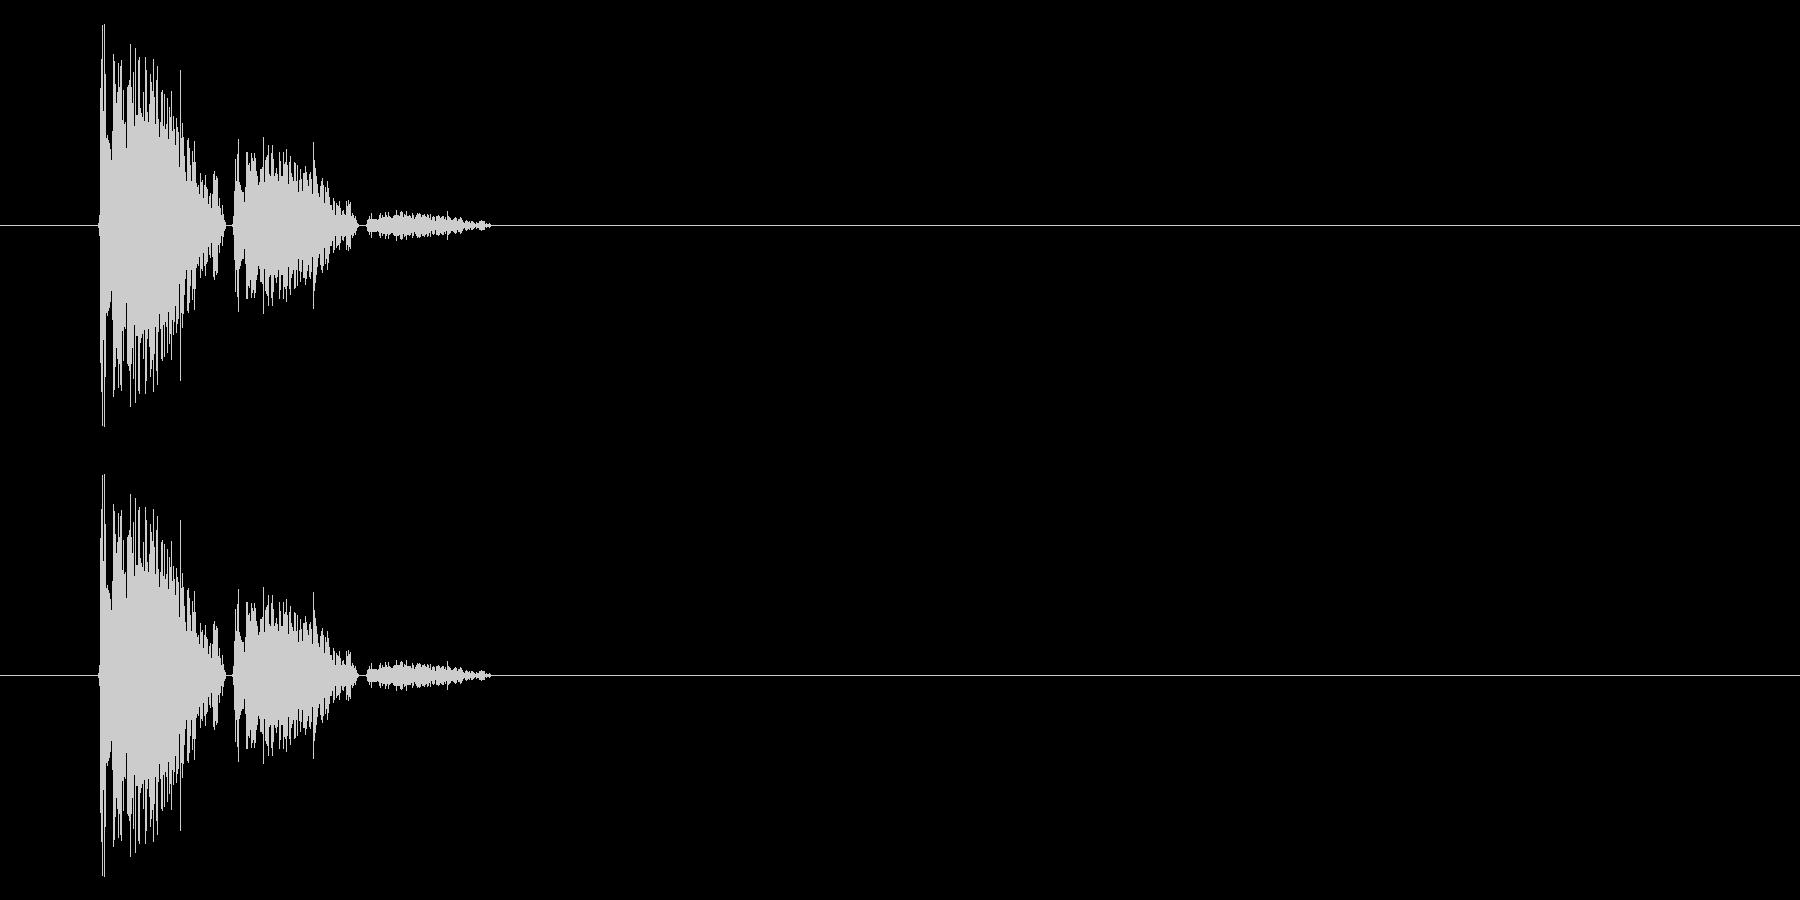 SNES 野球01-03(木製バット)の未再生の波形